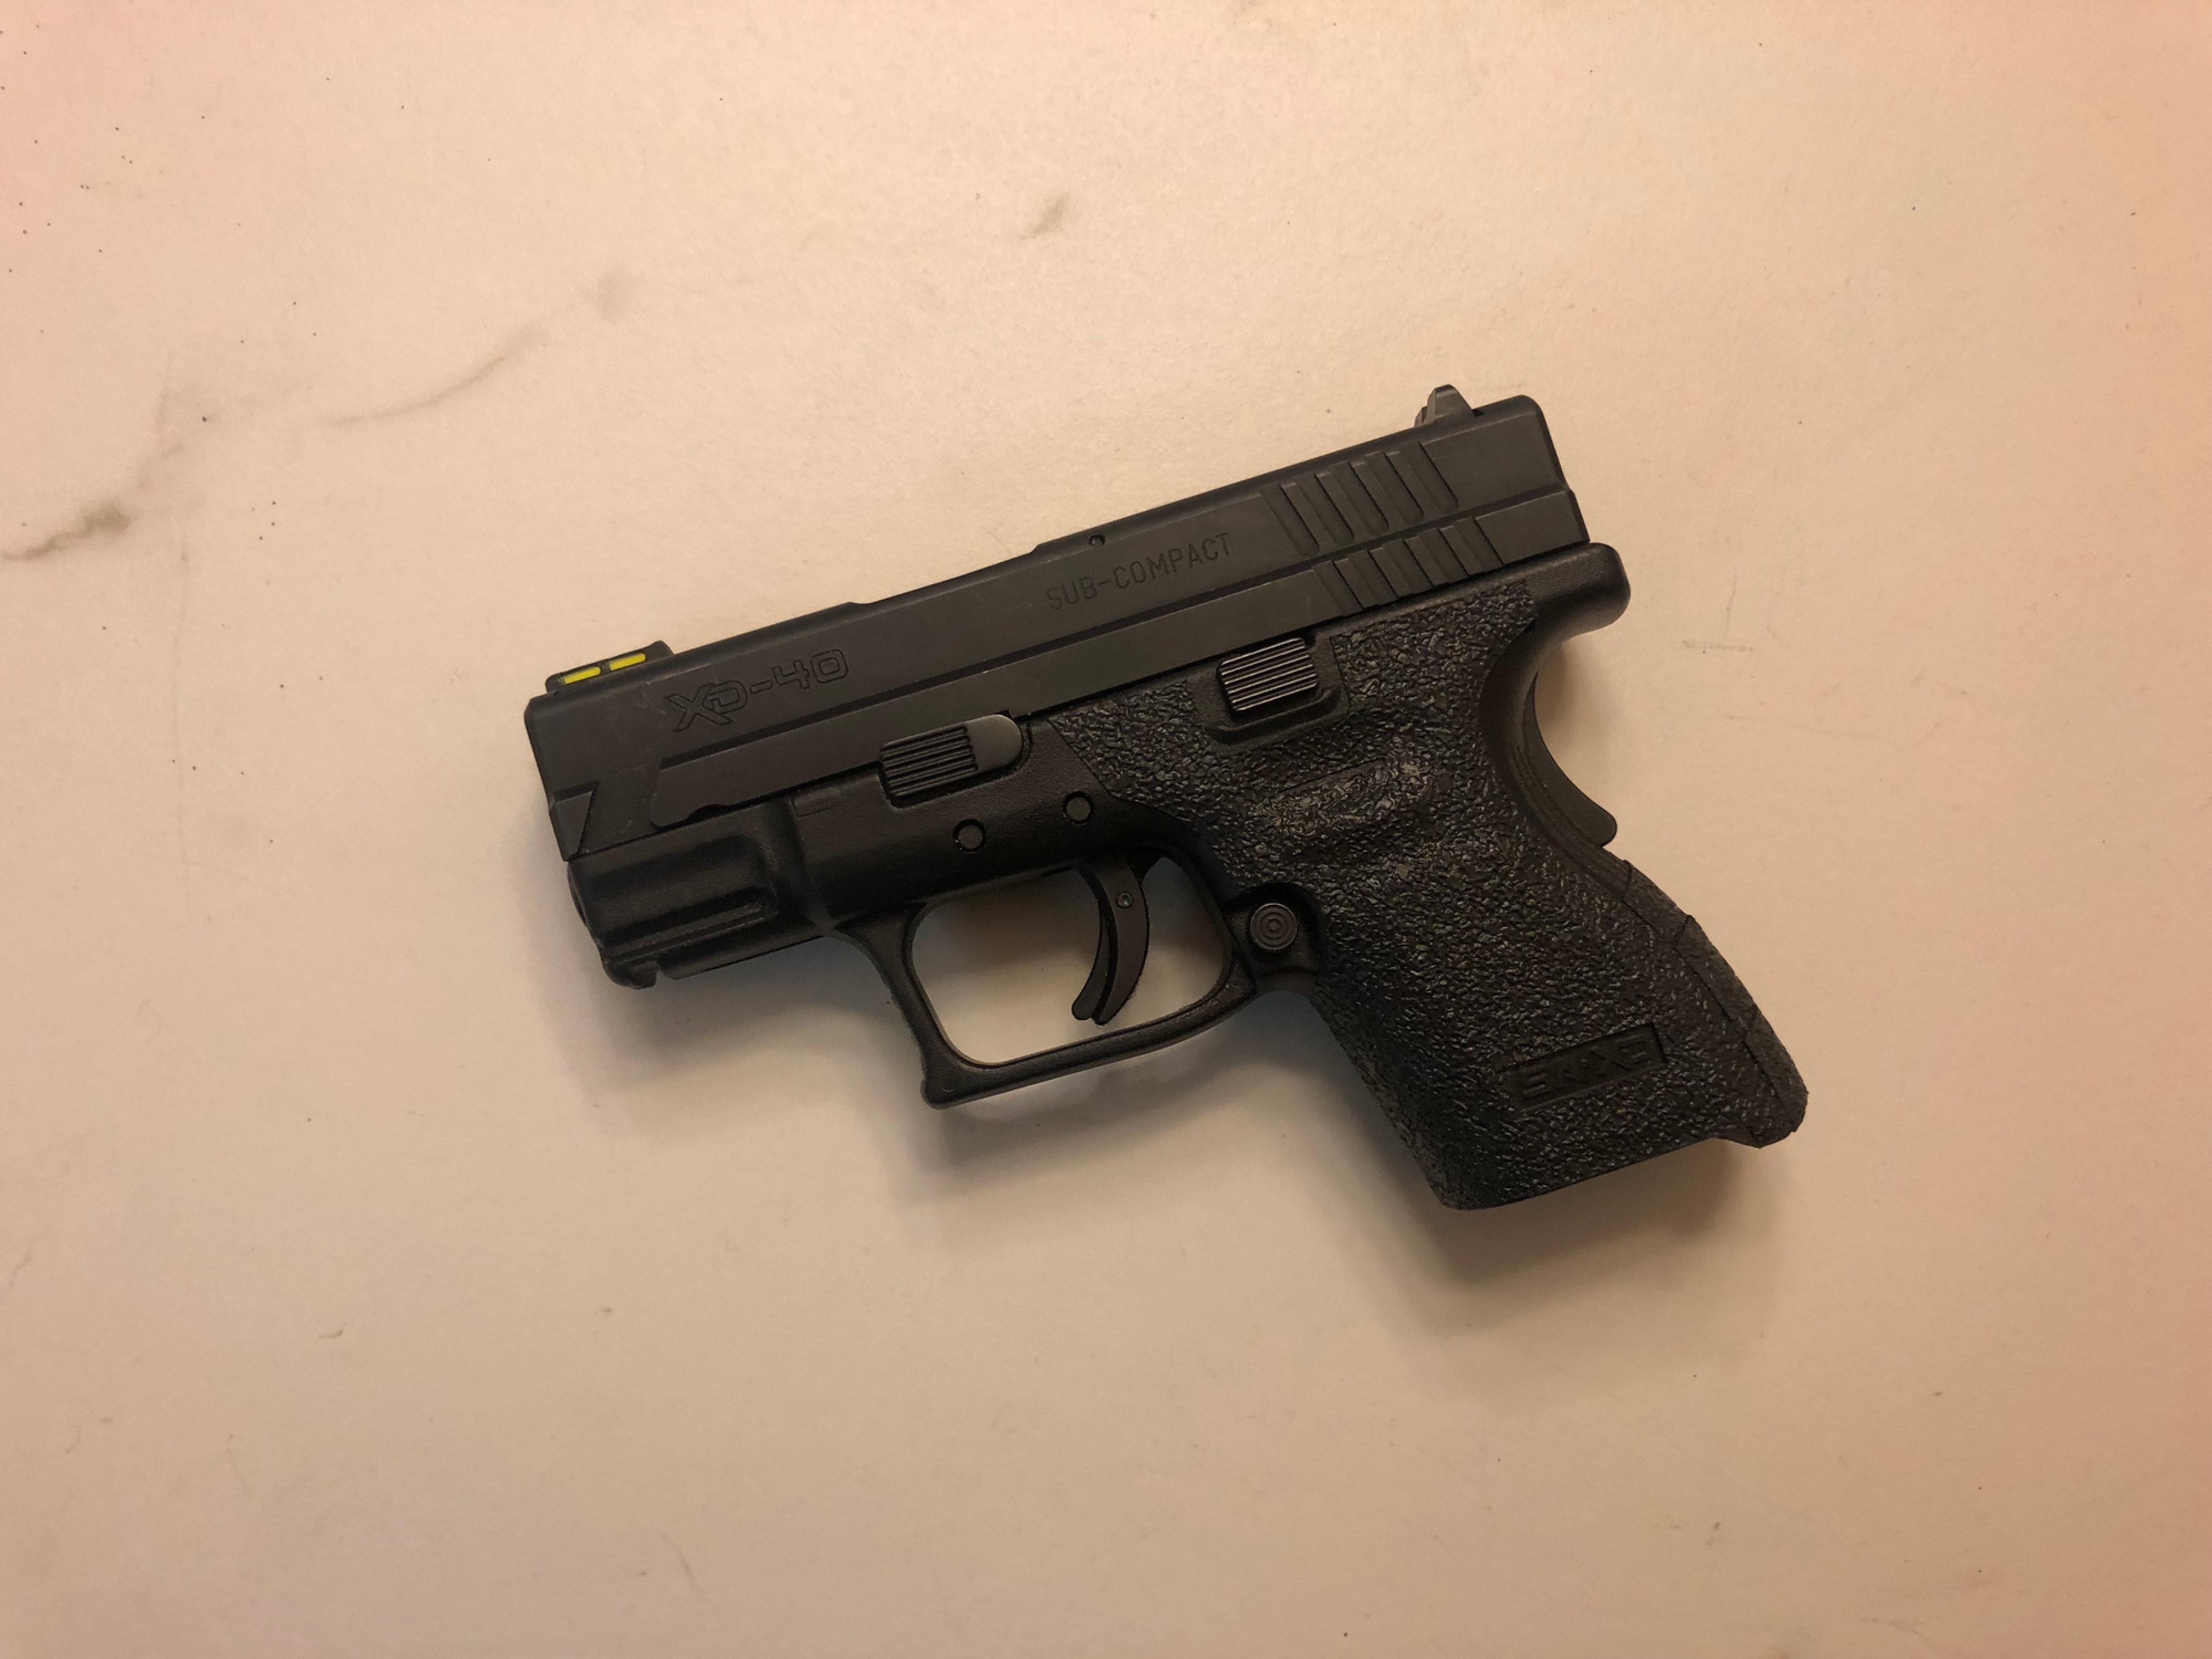 Springfield XD Sub Compact 9/40 Textured Rubber Gun Grip Enhancement Kit